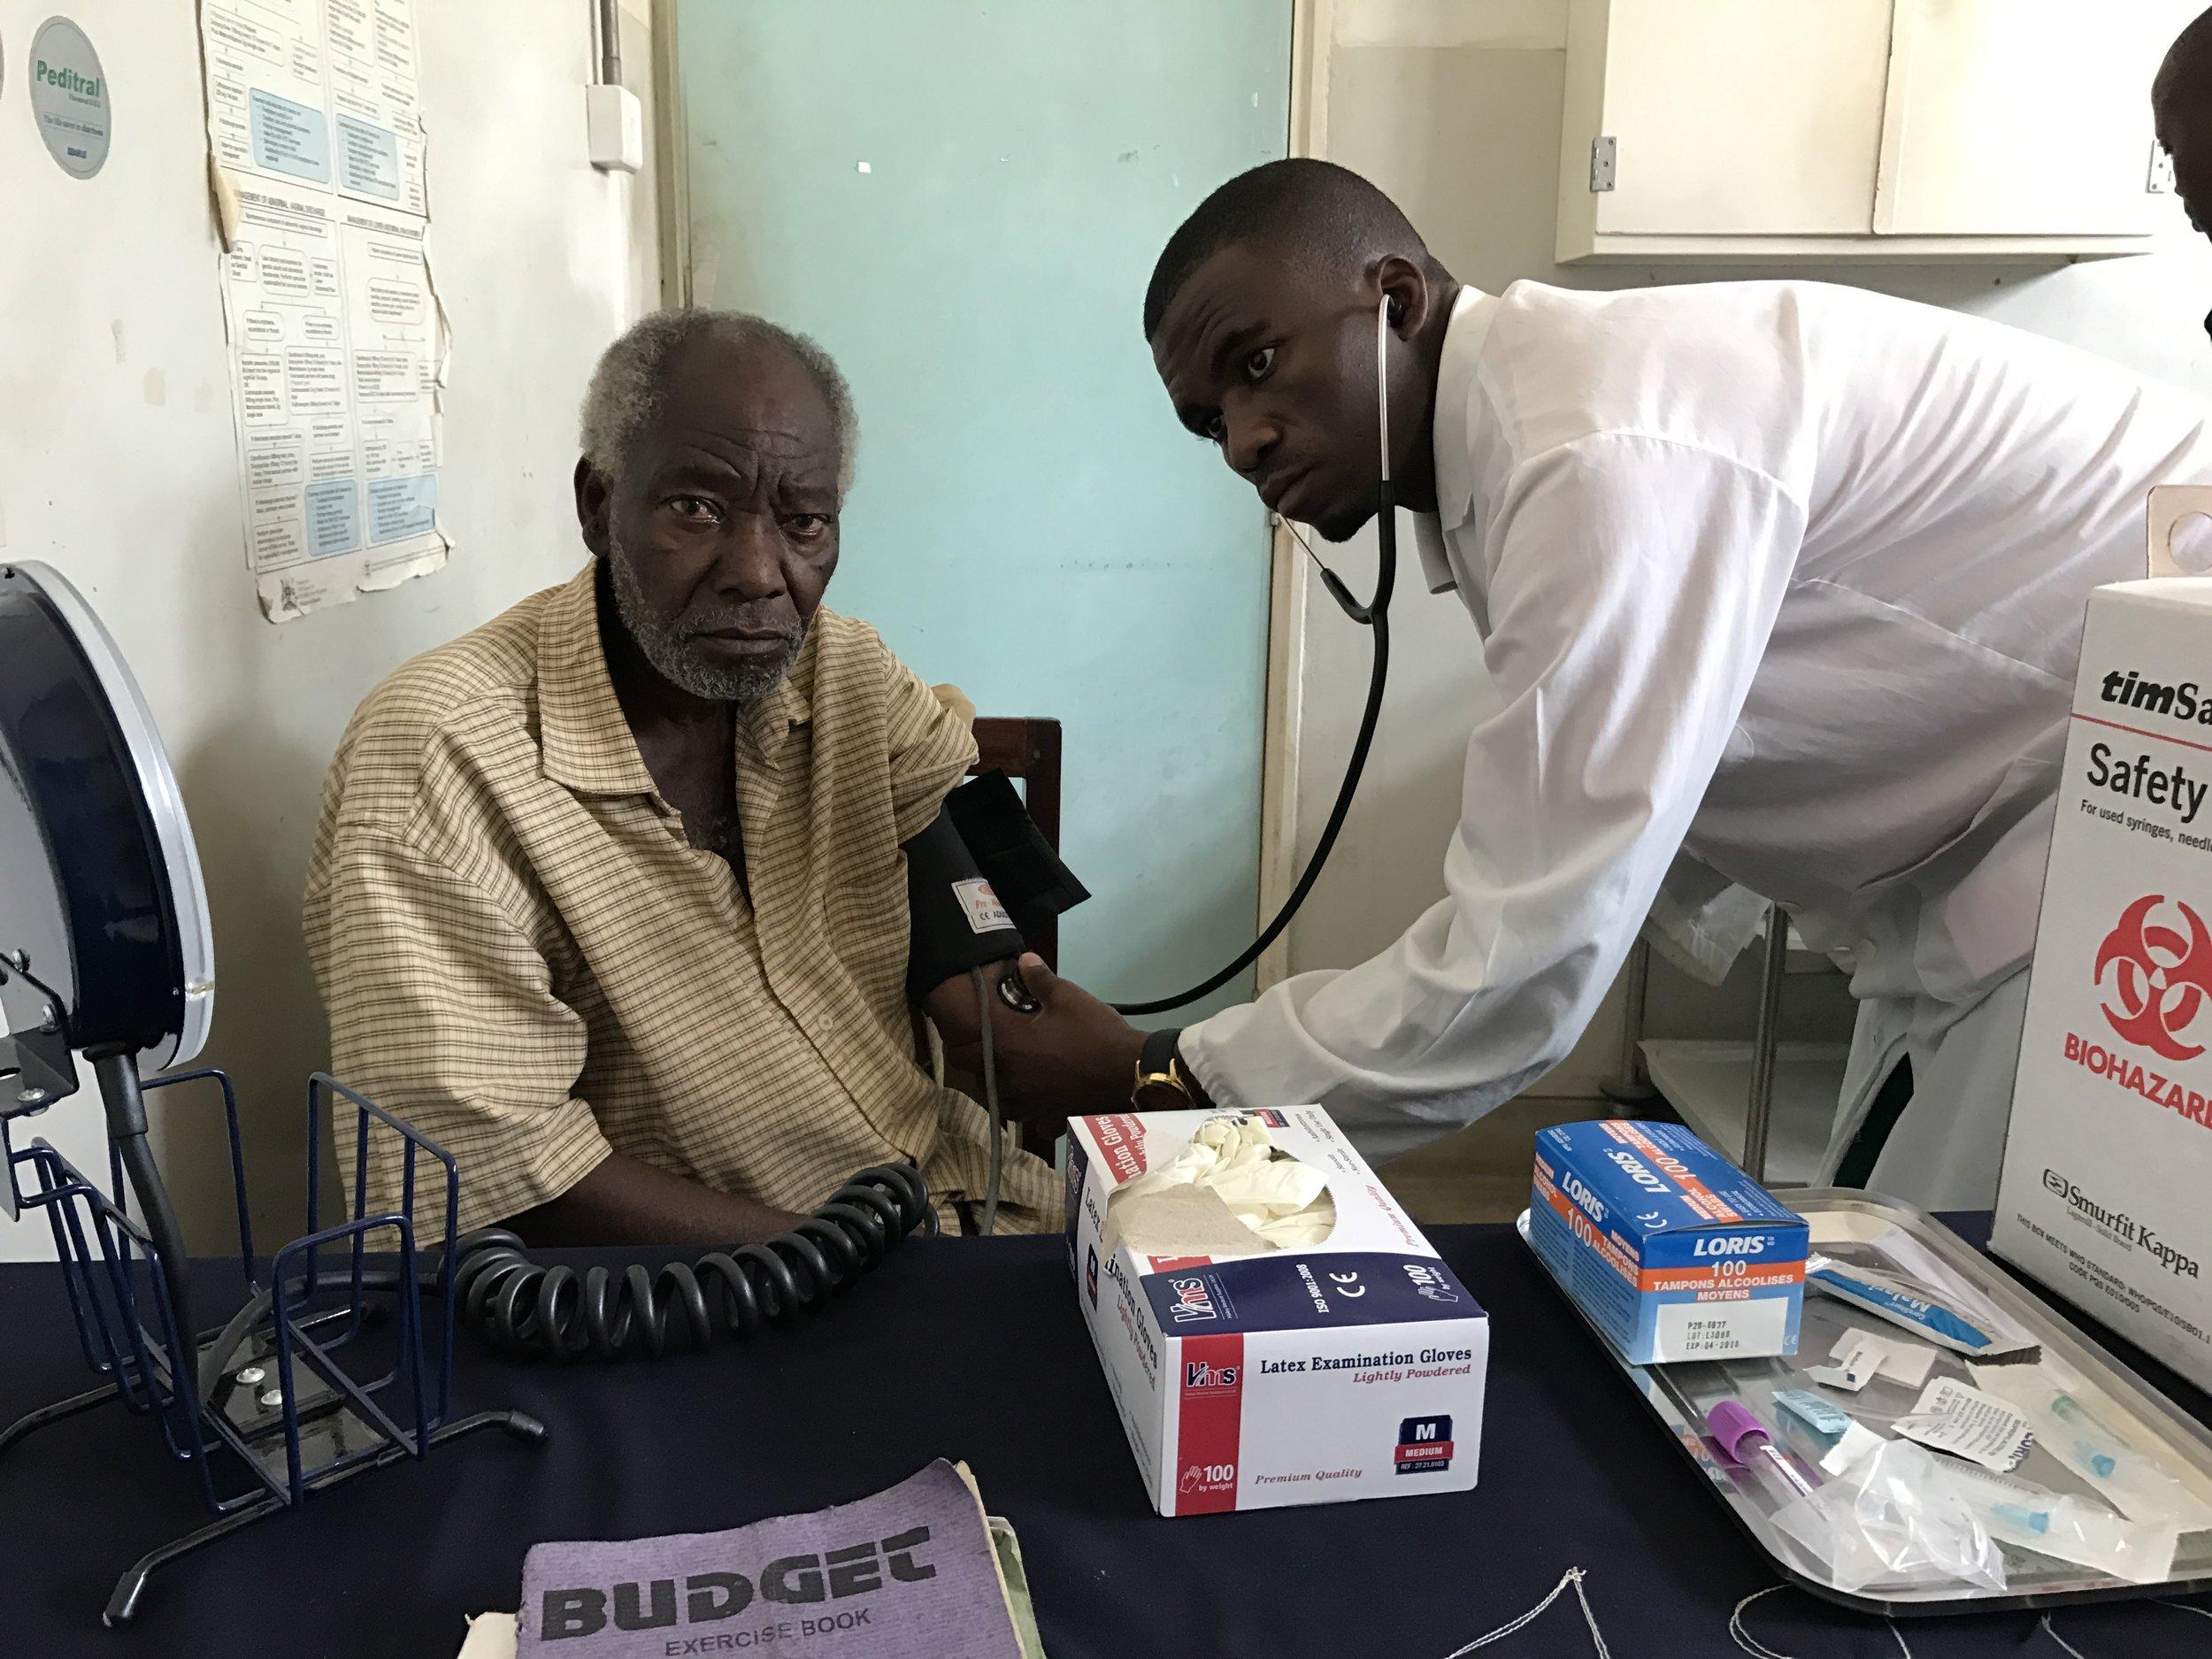 A chronic disease patient having his blood pressure taken.